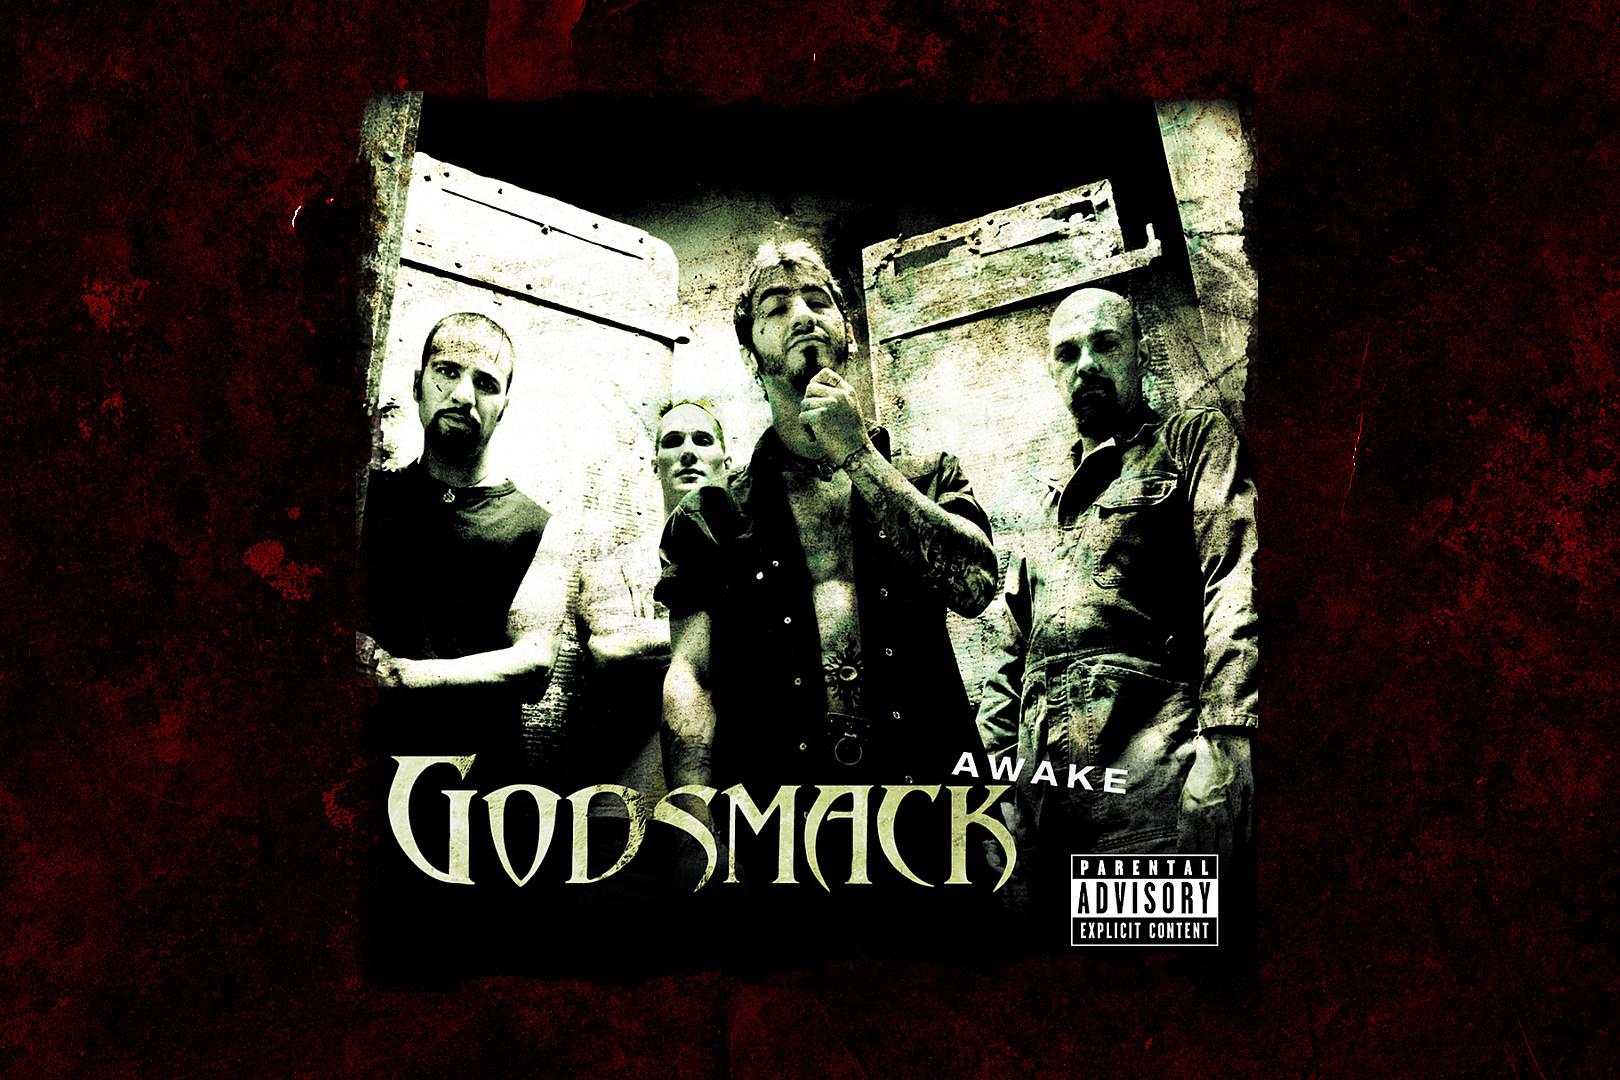 19 Years Ago: Godsmack Issue Release Second Album 'Awake'